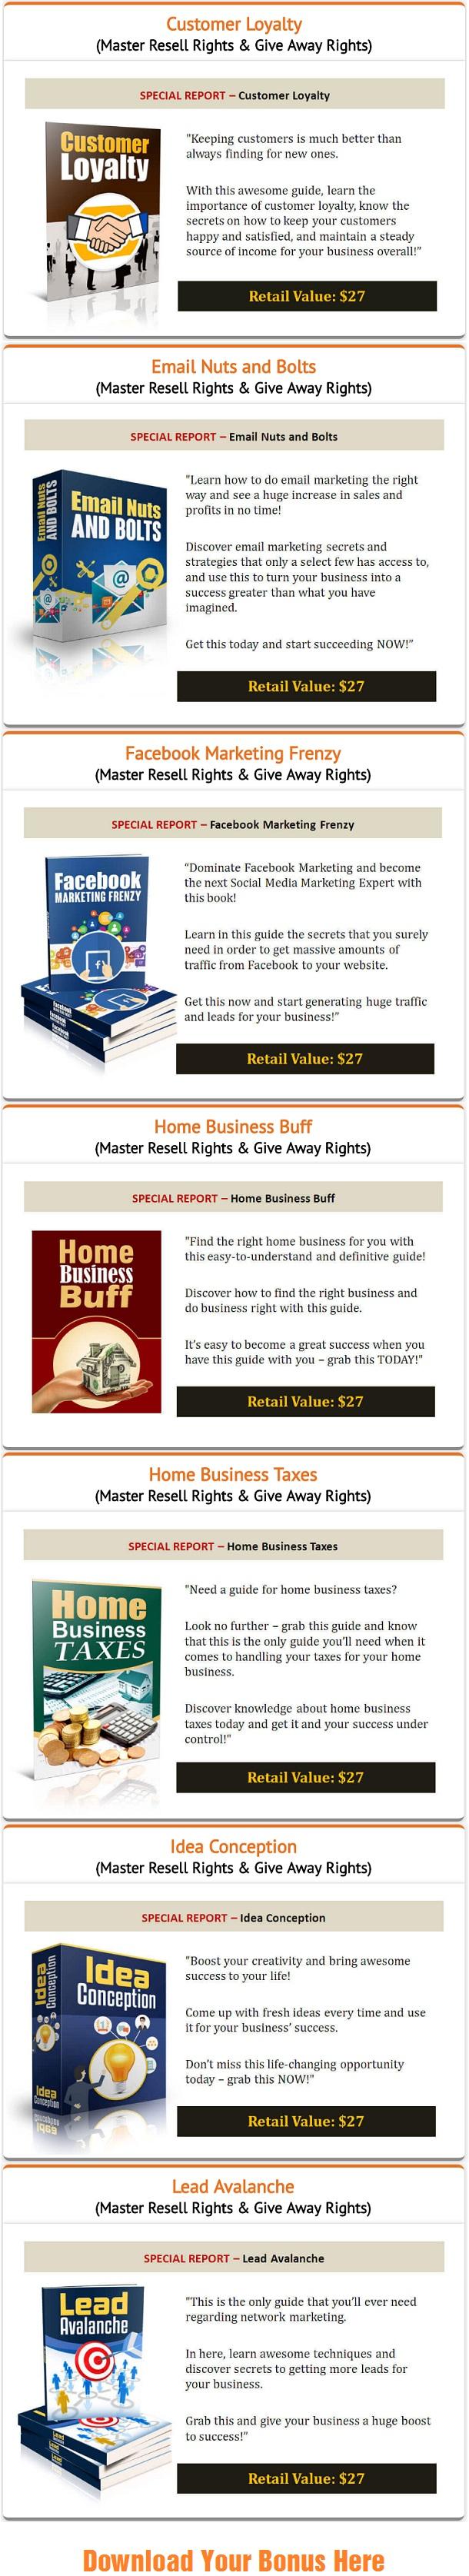 Internet Marketing Mastery 2.0 Bonus